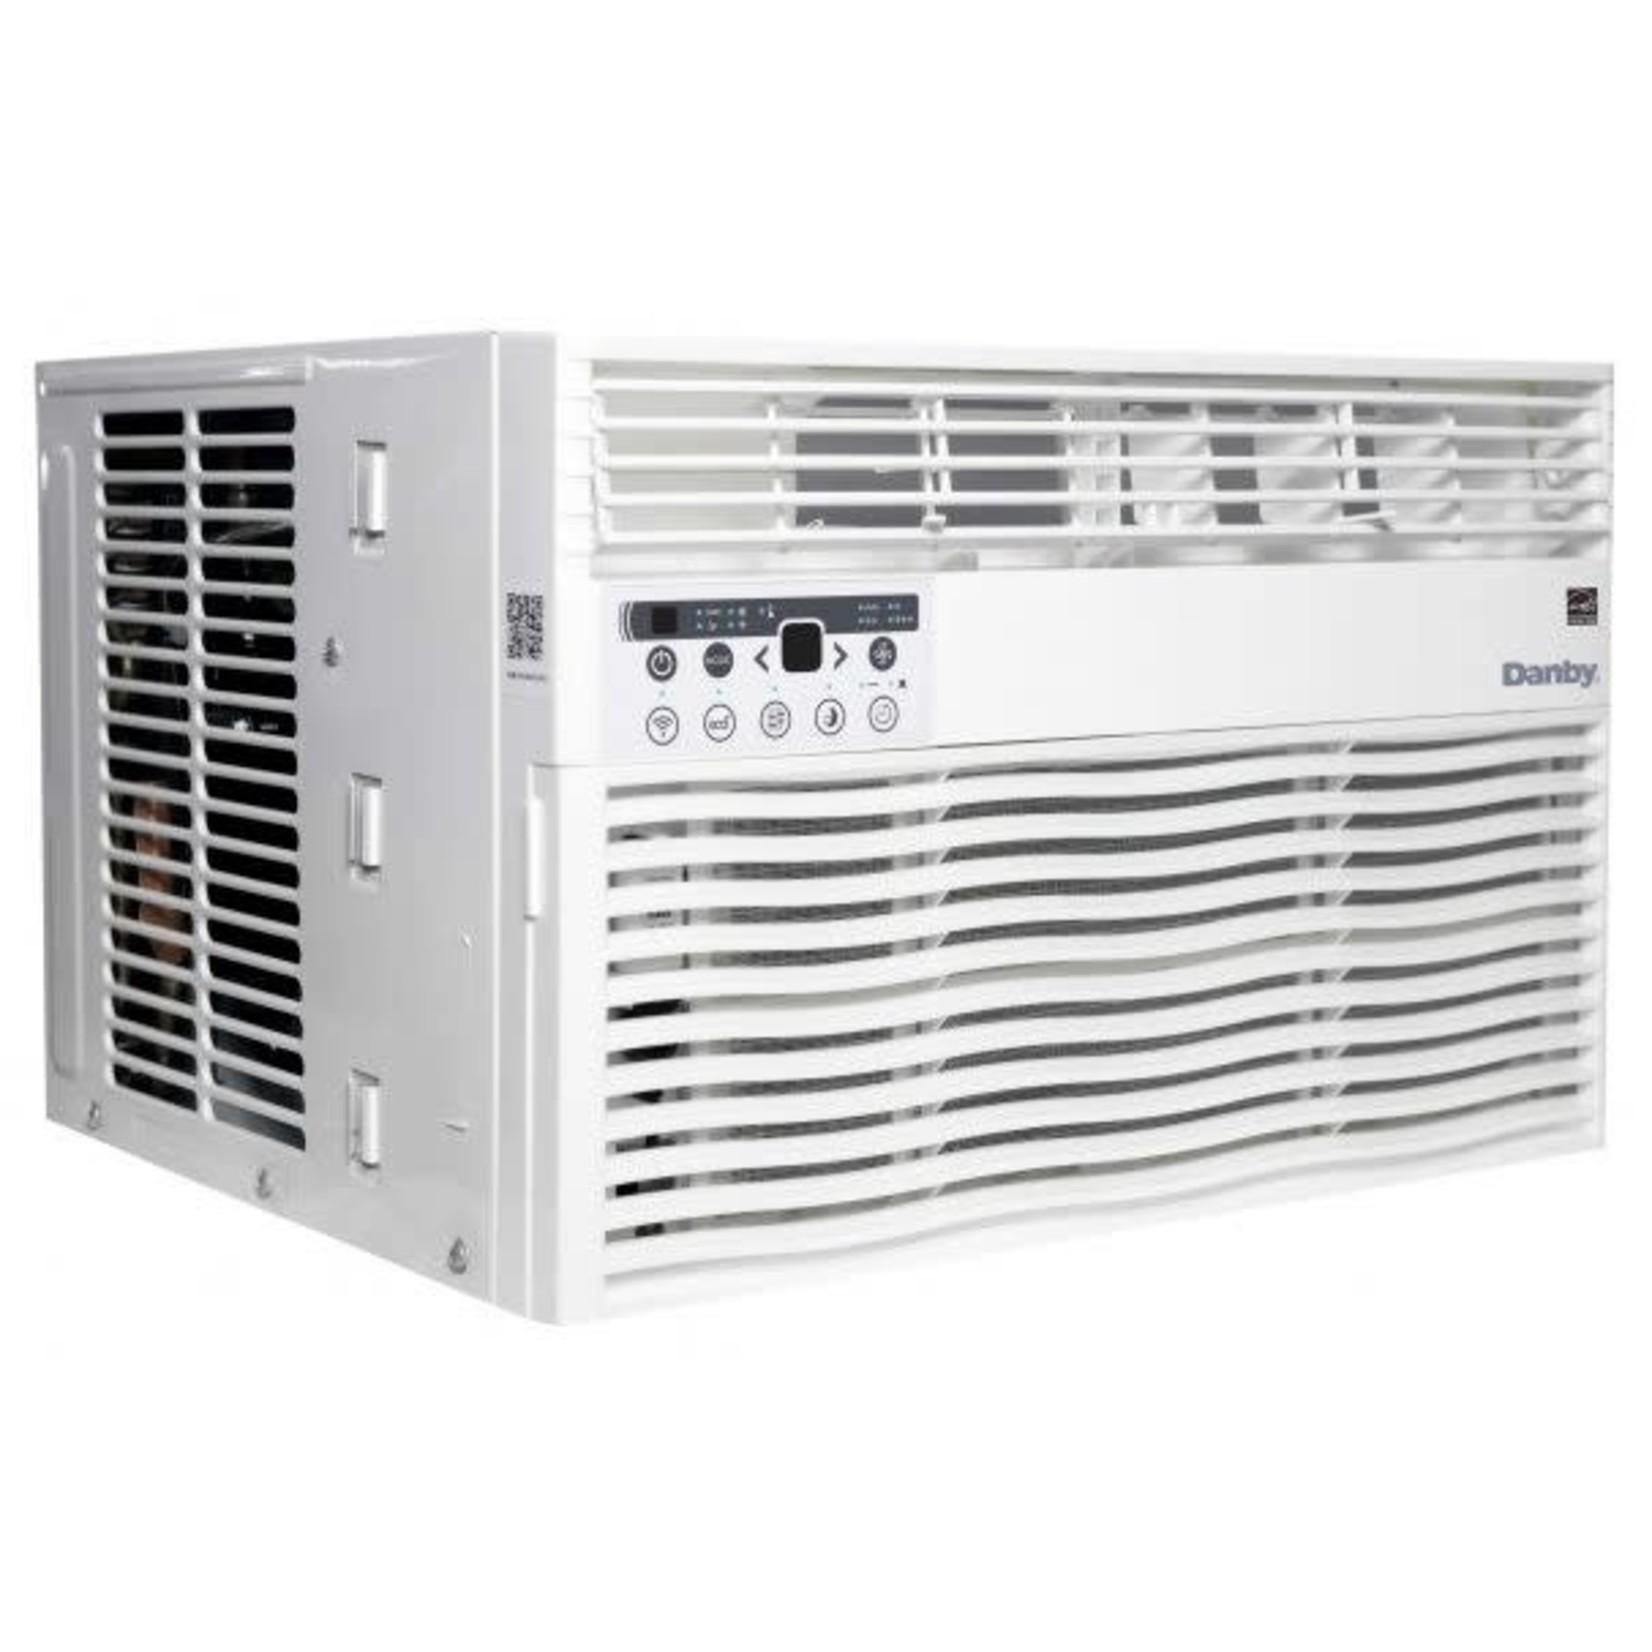 DANBY Danby 12,000 BTU Window Air Conditioner